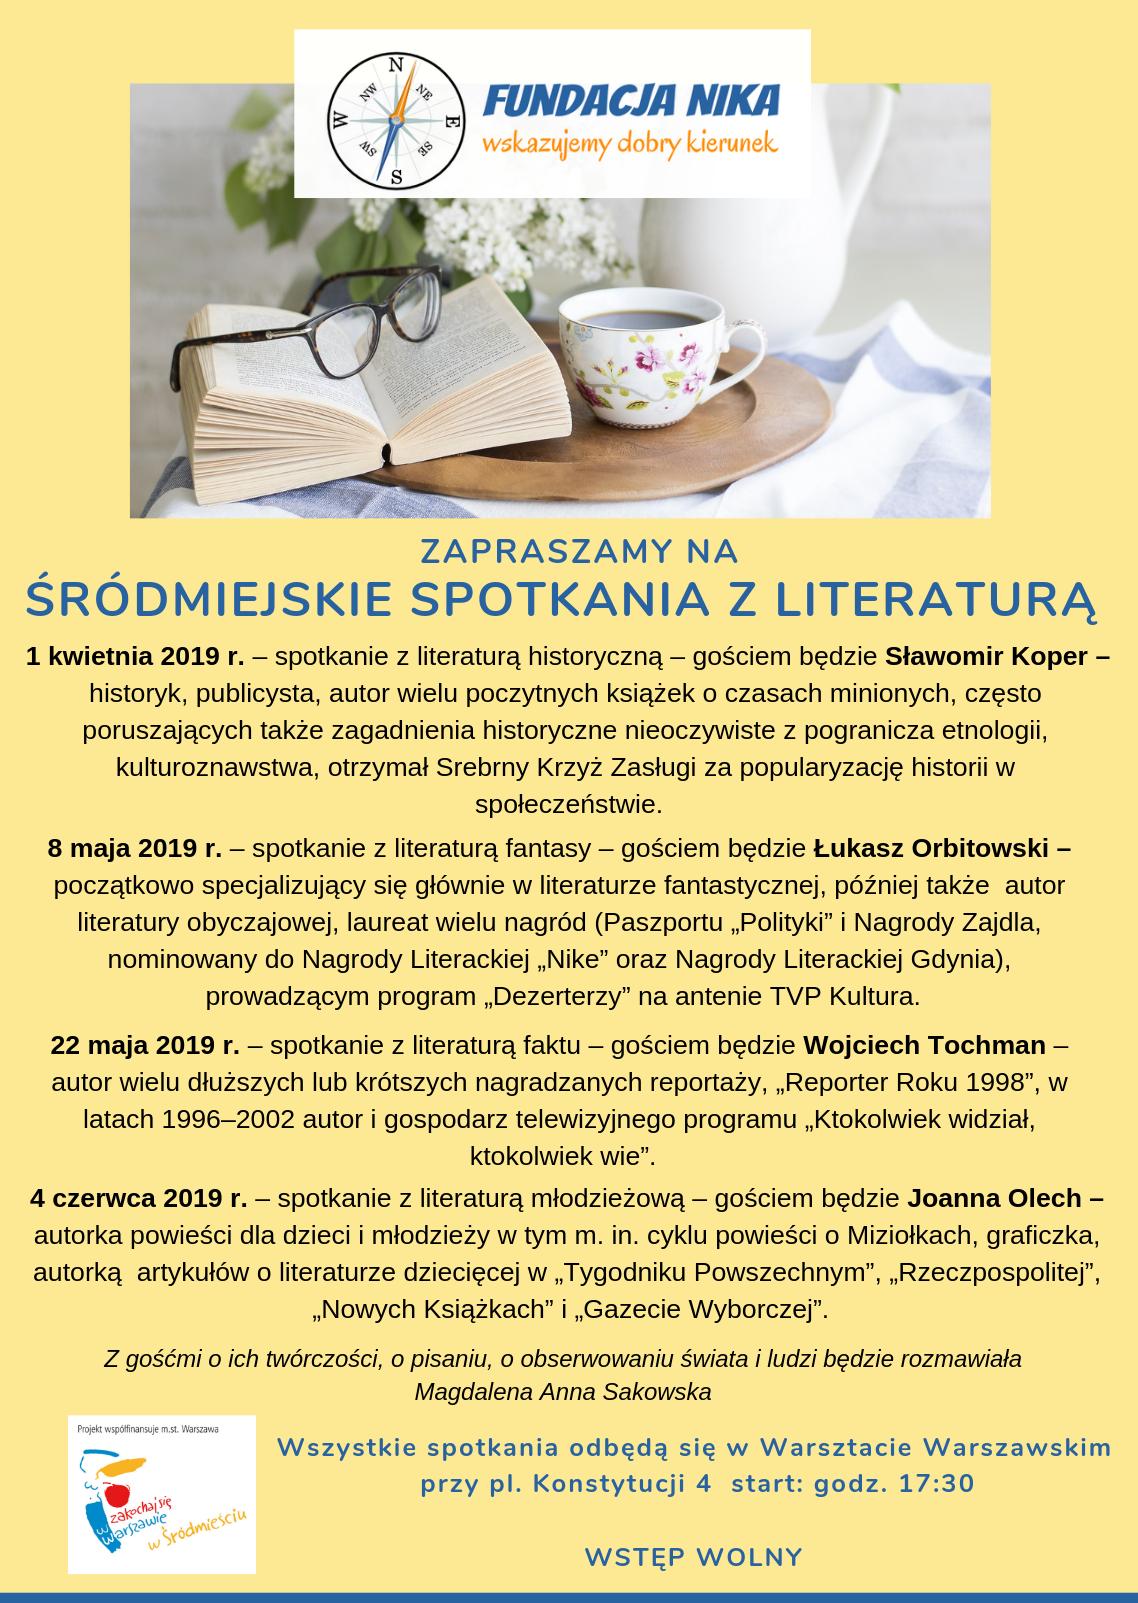 Thumbnail for the post titled: Śródmiejskie Spotkania zLiteraturą